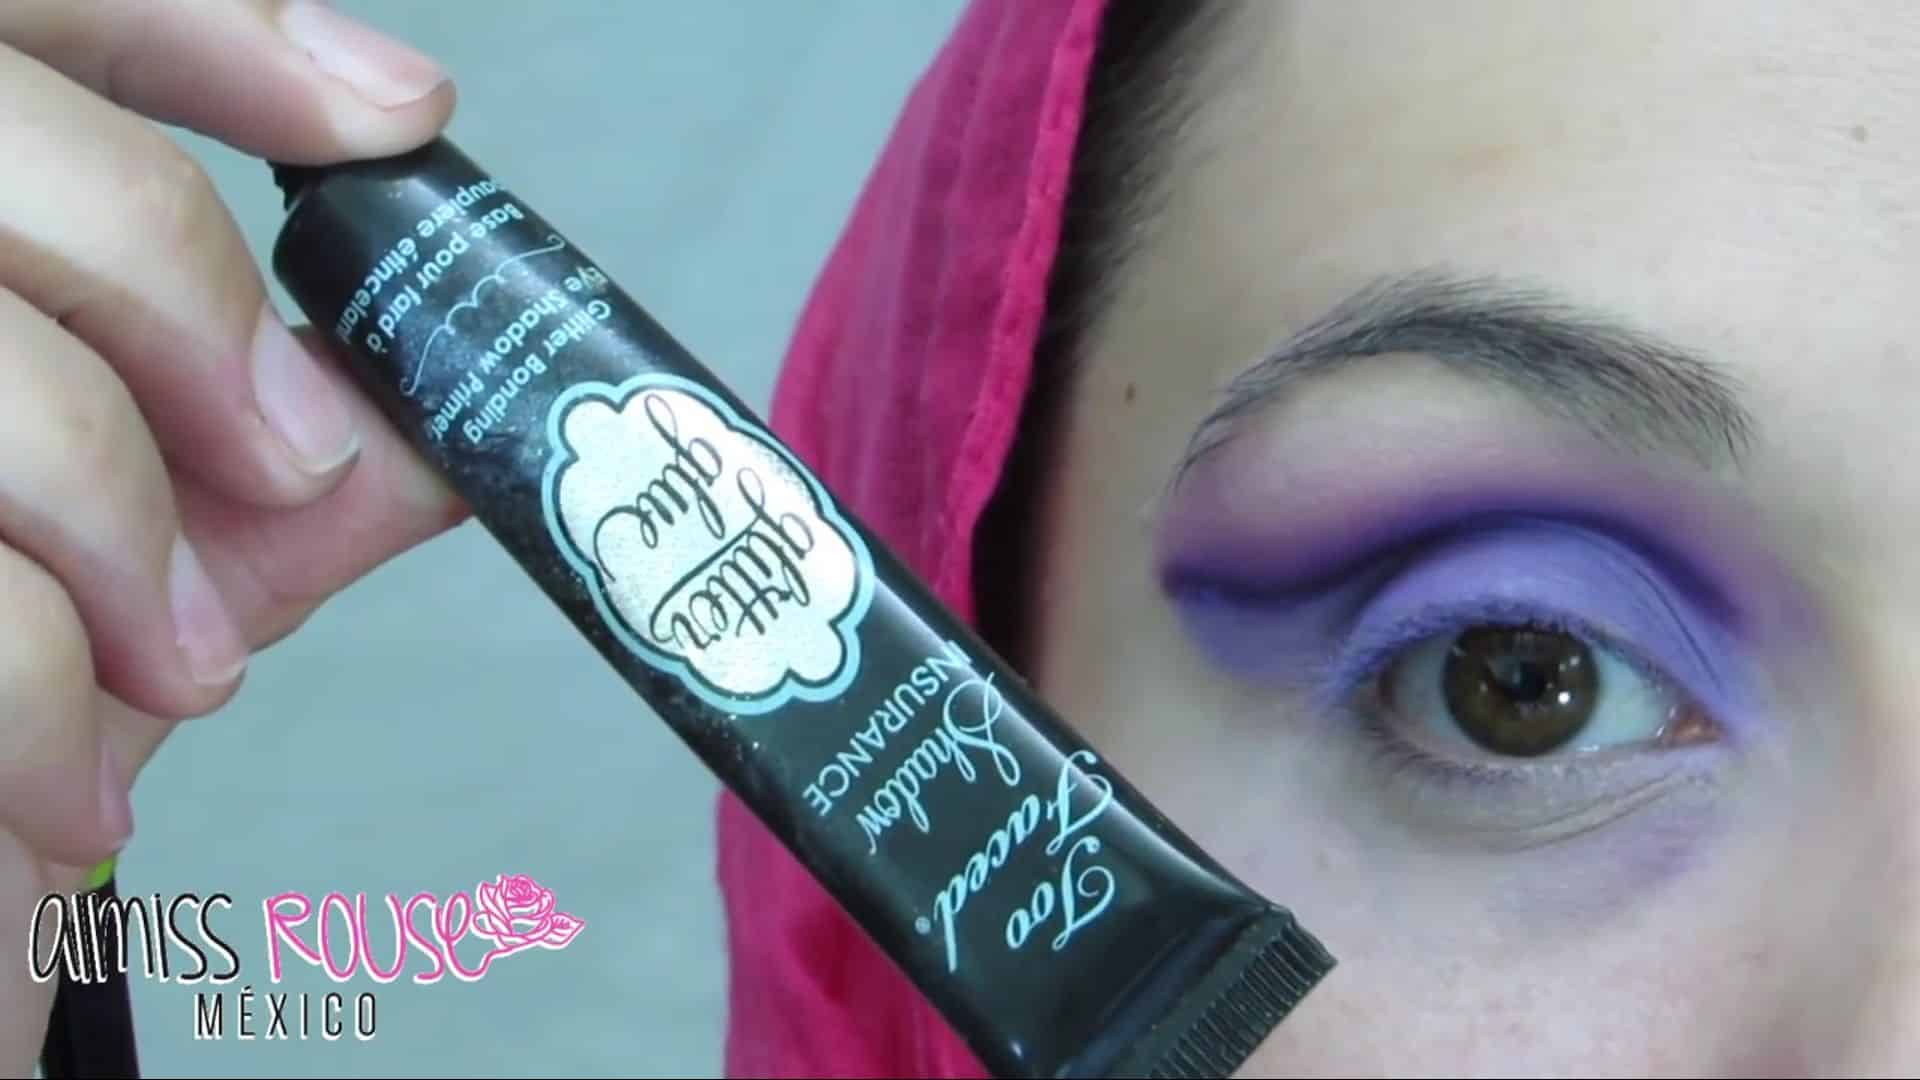 Paso a paso maquillaje Árabe almiss rouse 2020, pegamento de glitter para el párpado móvil.